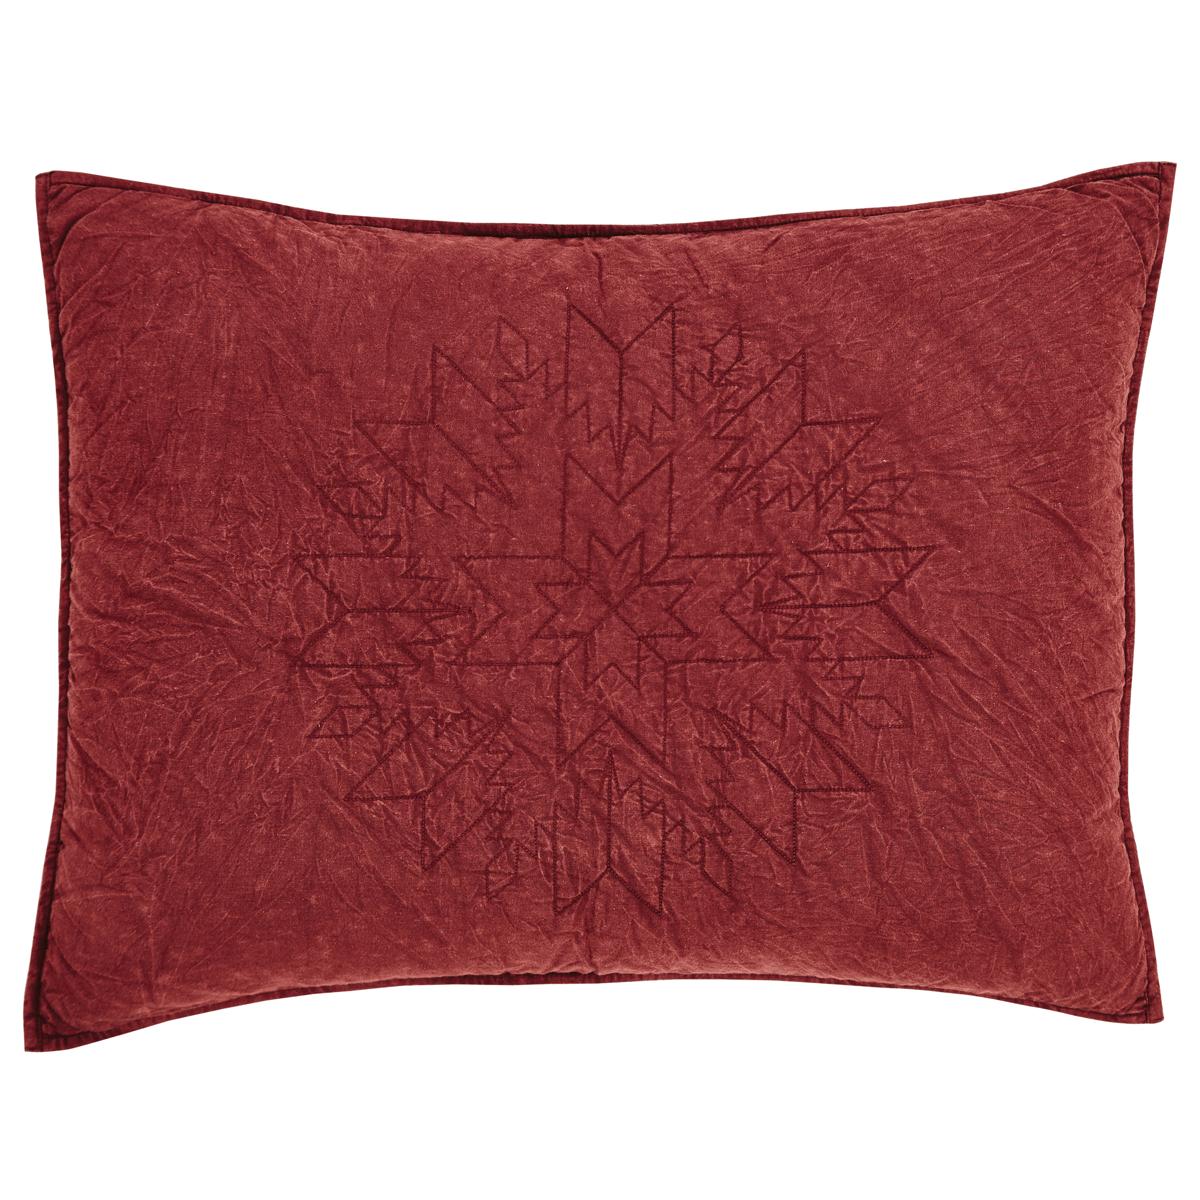 cheyenne american red standard pillow sham teton. Black Bedroom Furniture Sets. Home Design Ideas